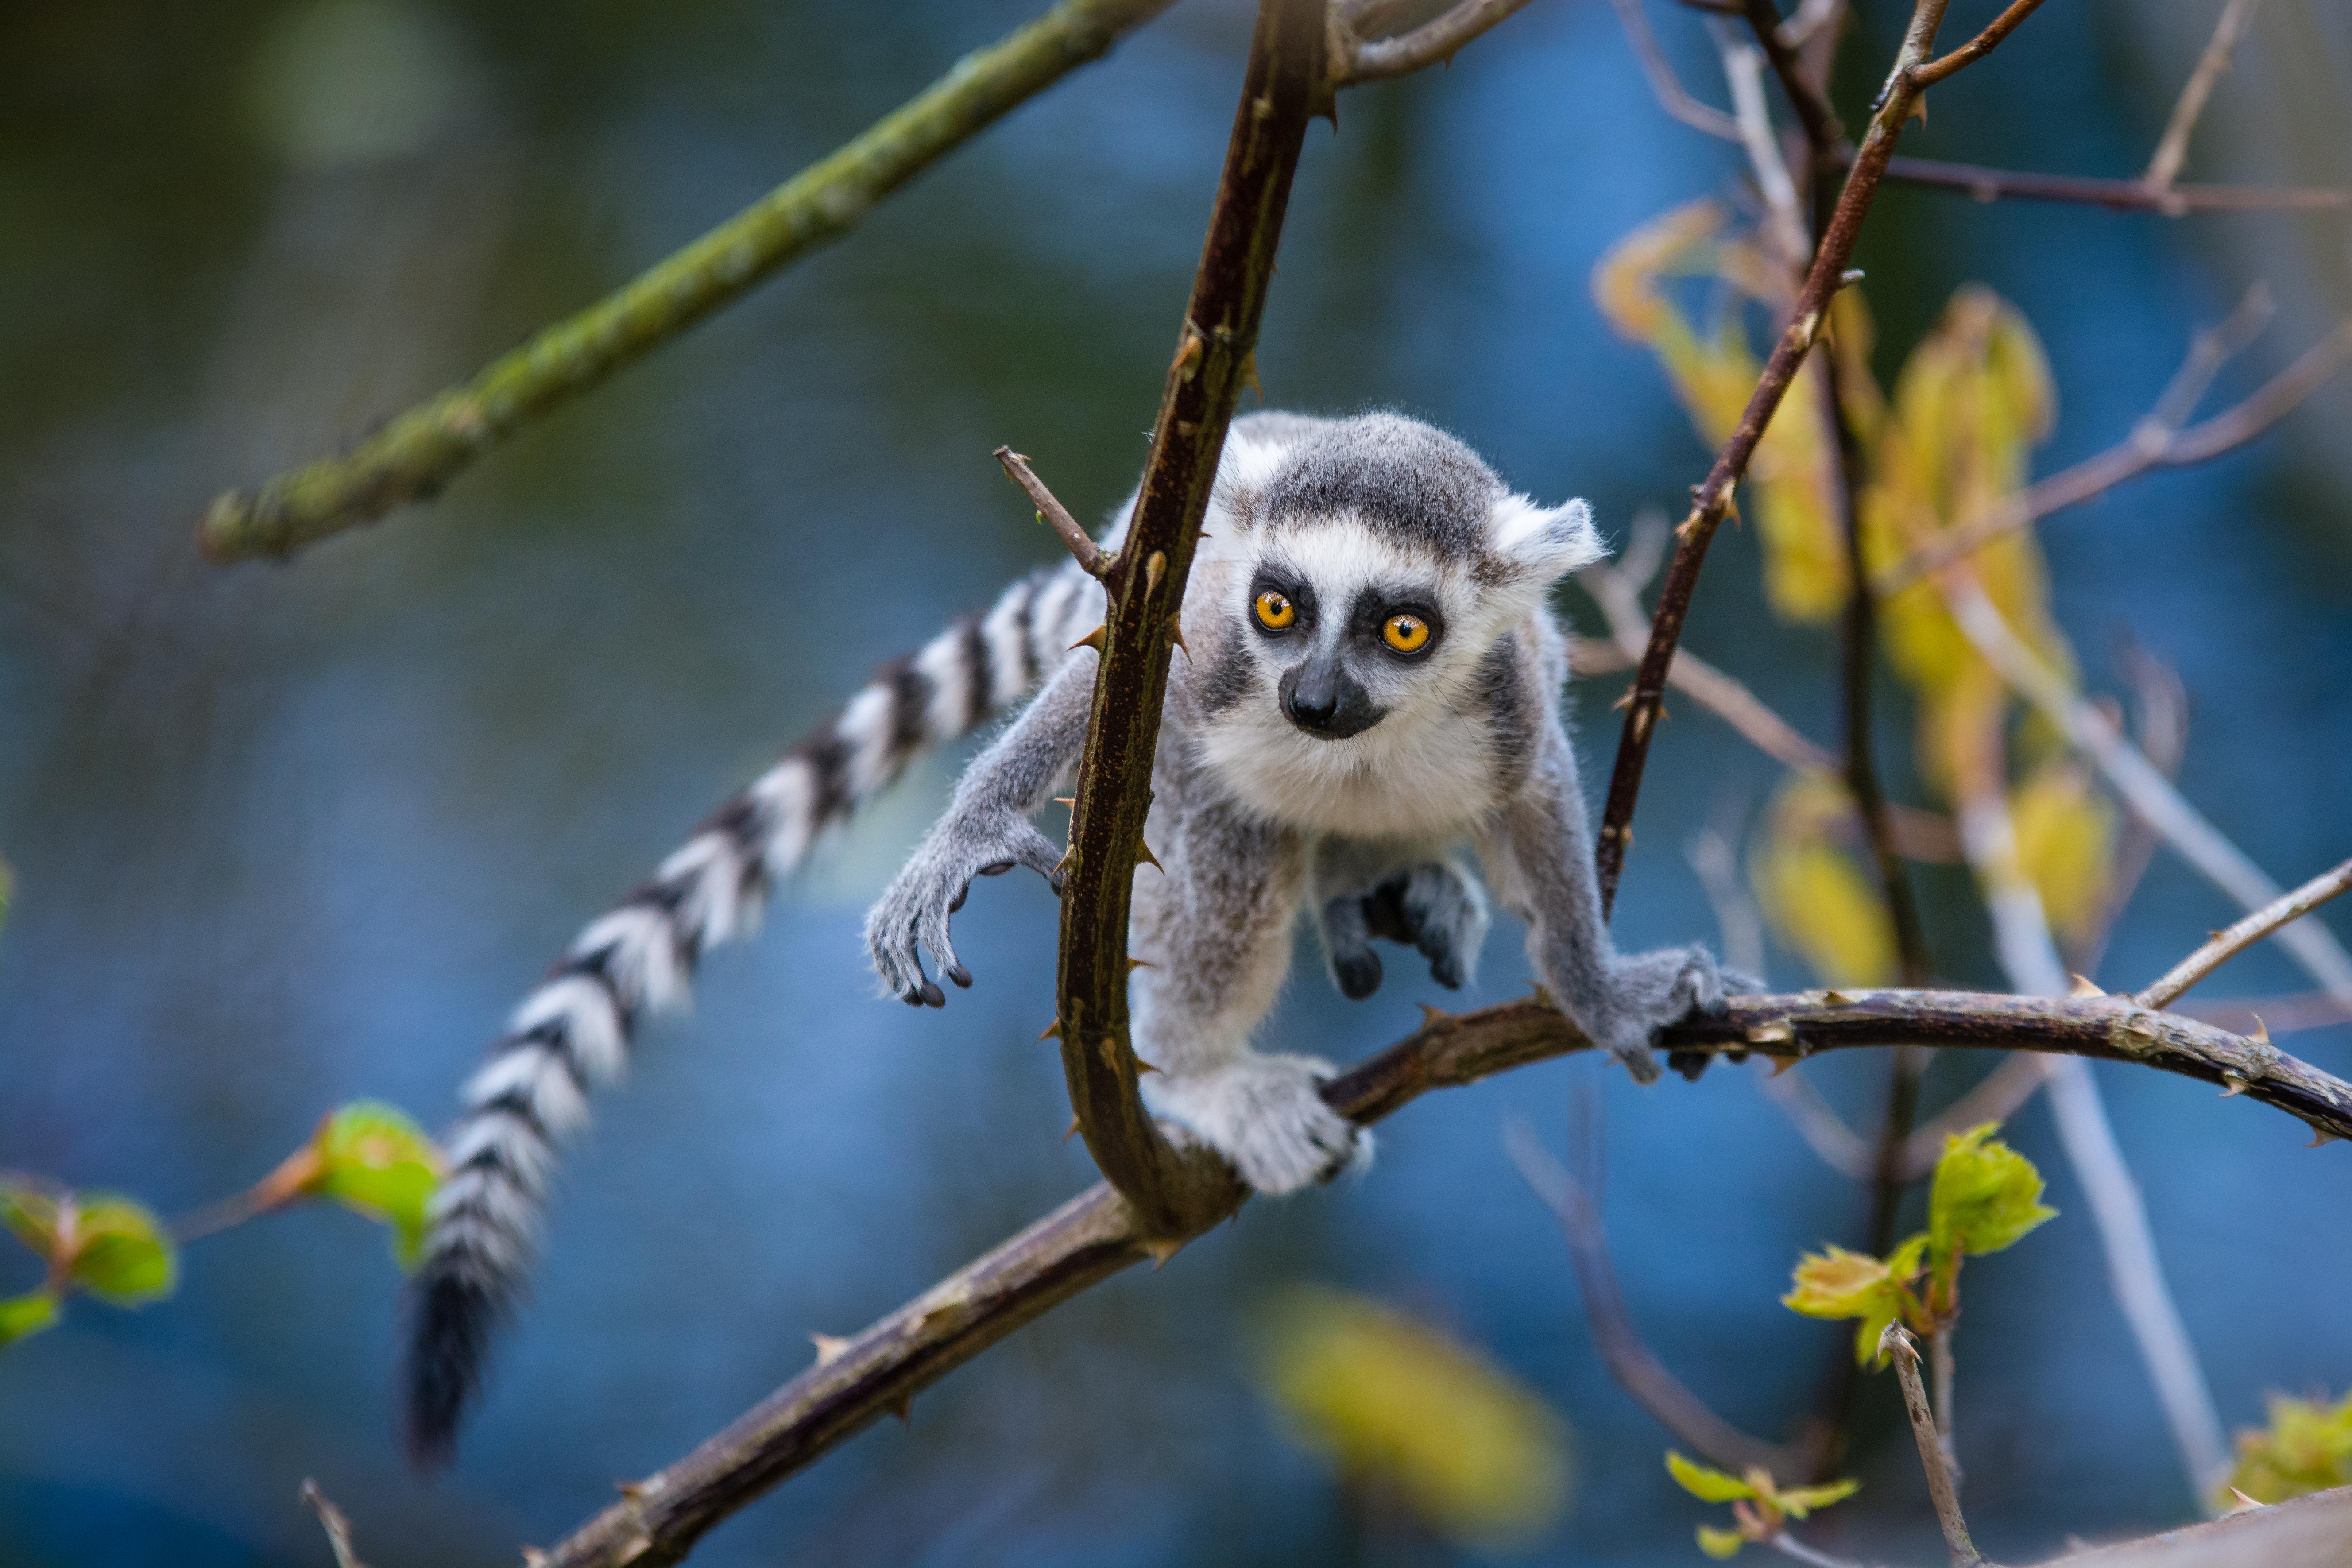 Ring-Tailed Lemur Baby, Adorable, Netherlands, Lemur, Lemuridae, HQ Photo